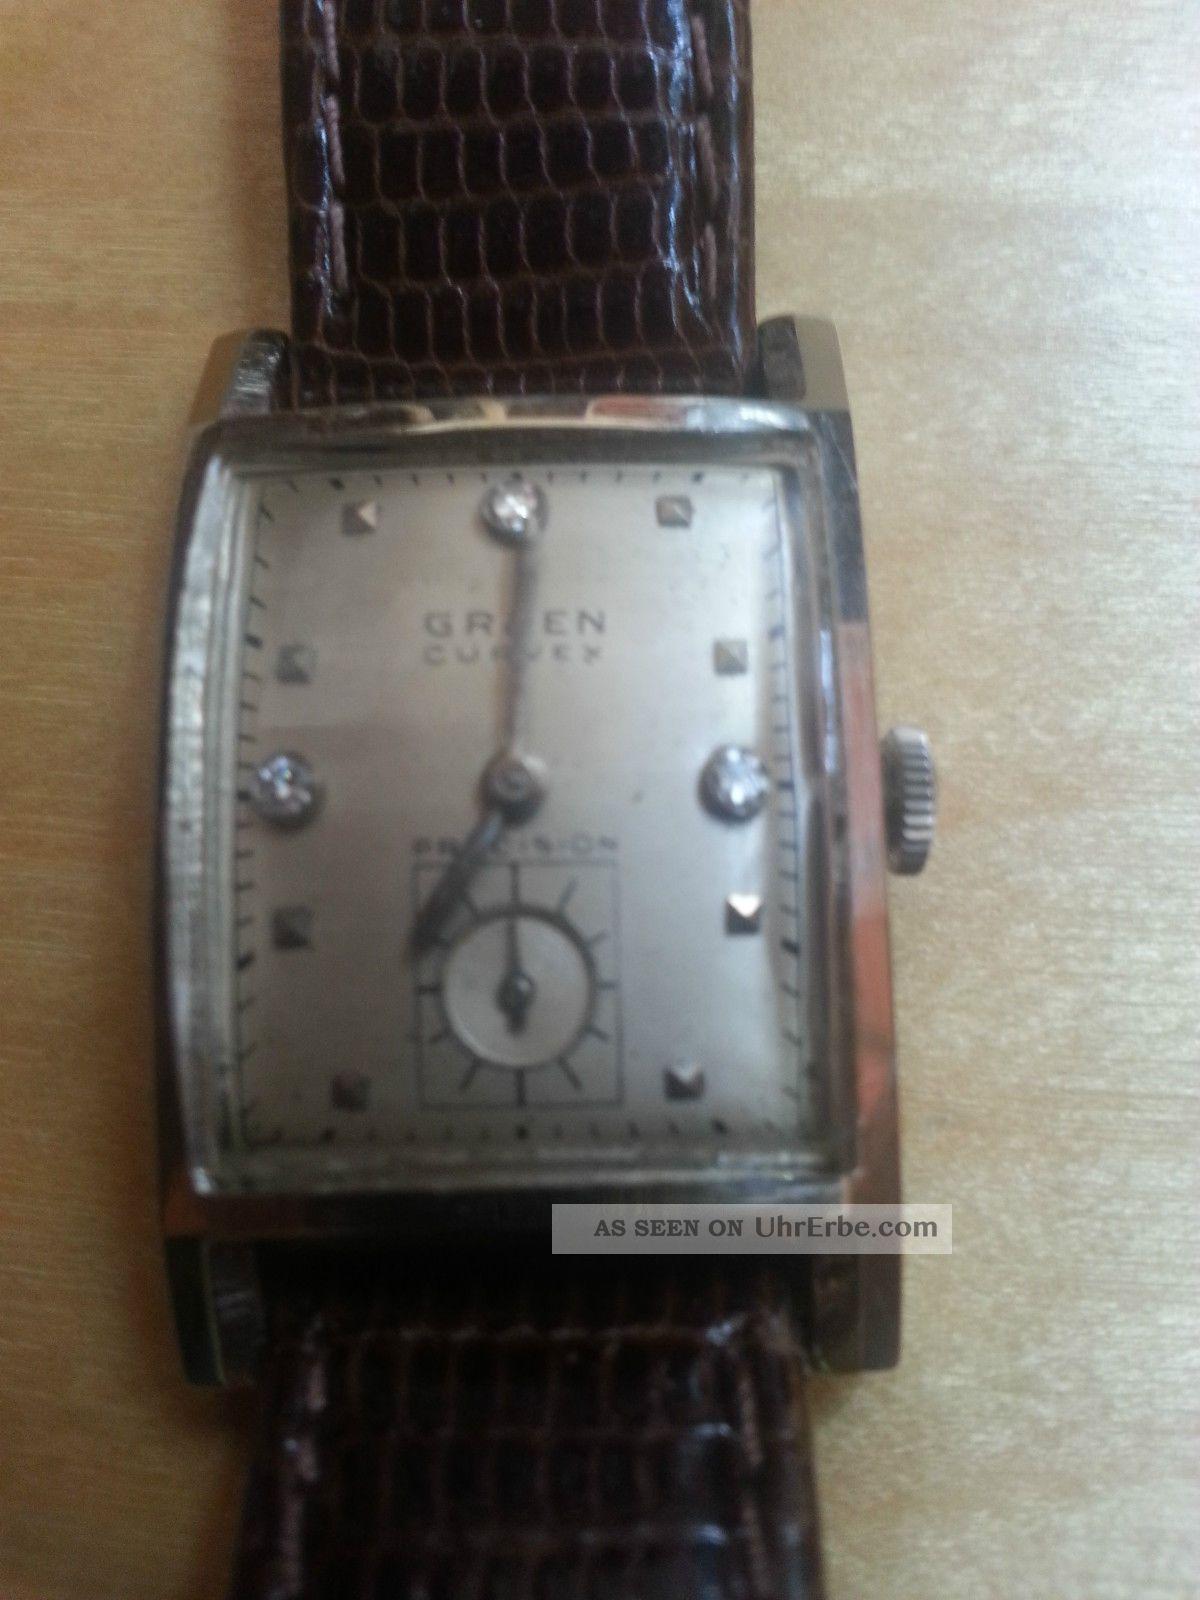 Gruen Precision Curvex Cal.  440 14kt Weissgold Zifferblatt Mit Diamanten Armbanduhren Bild